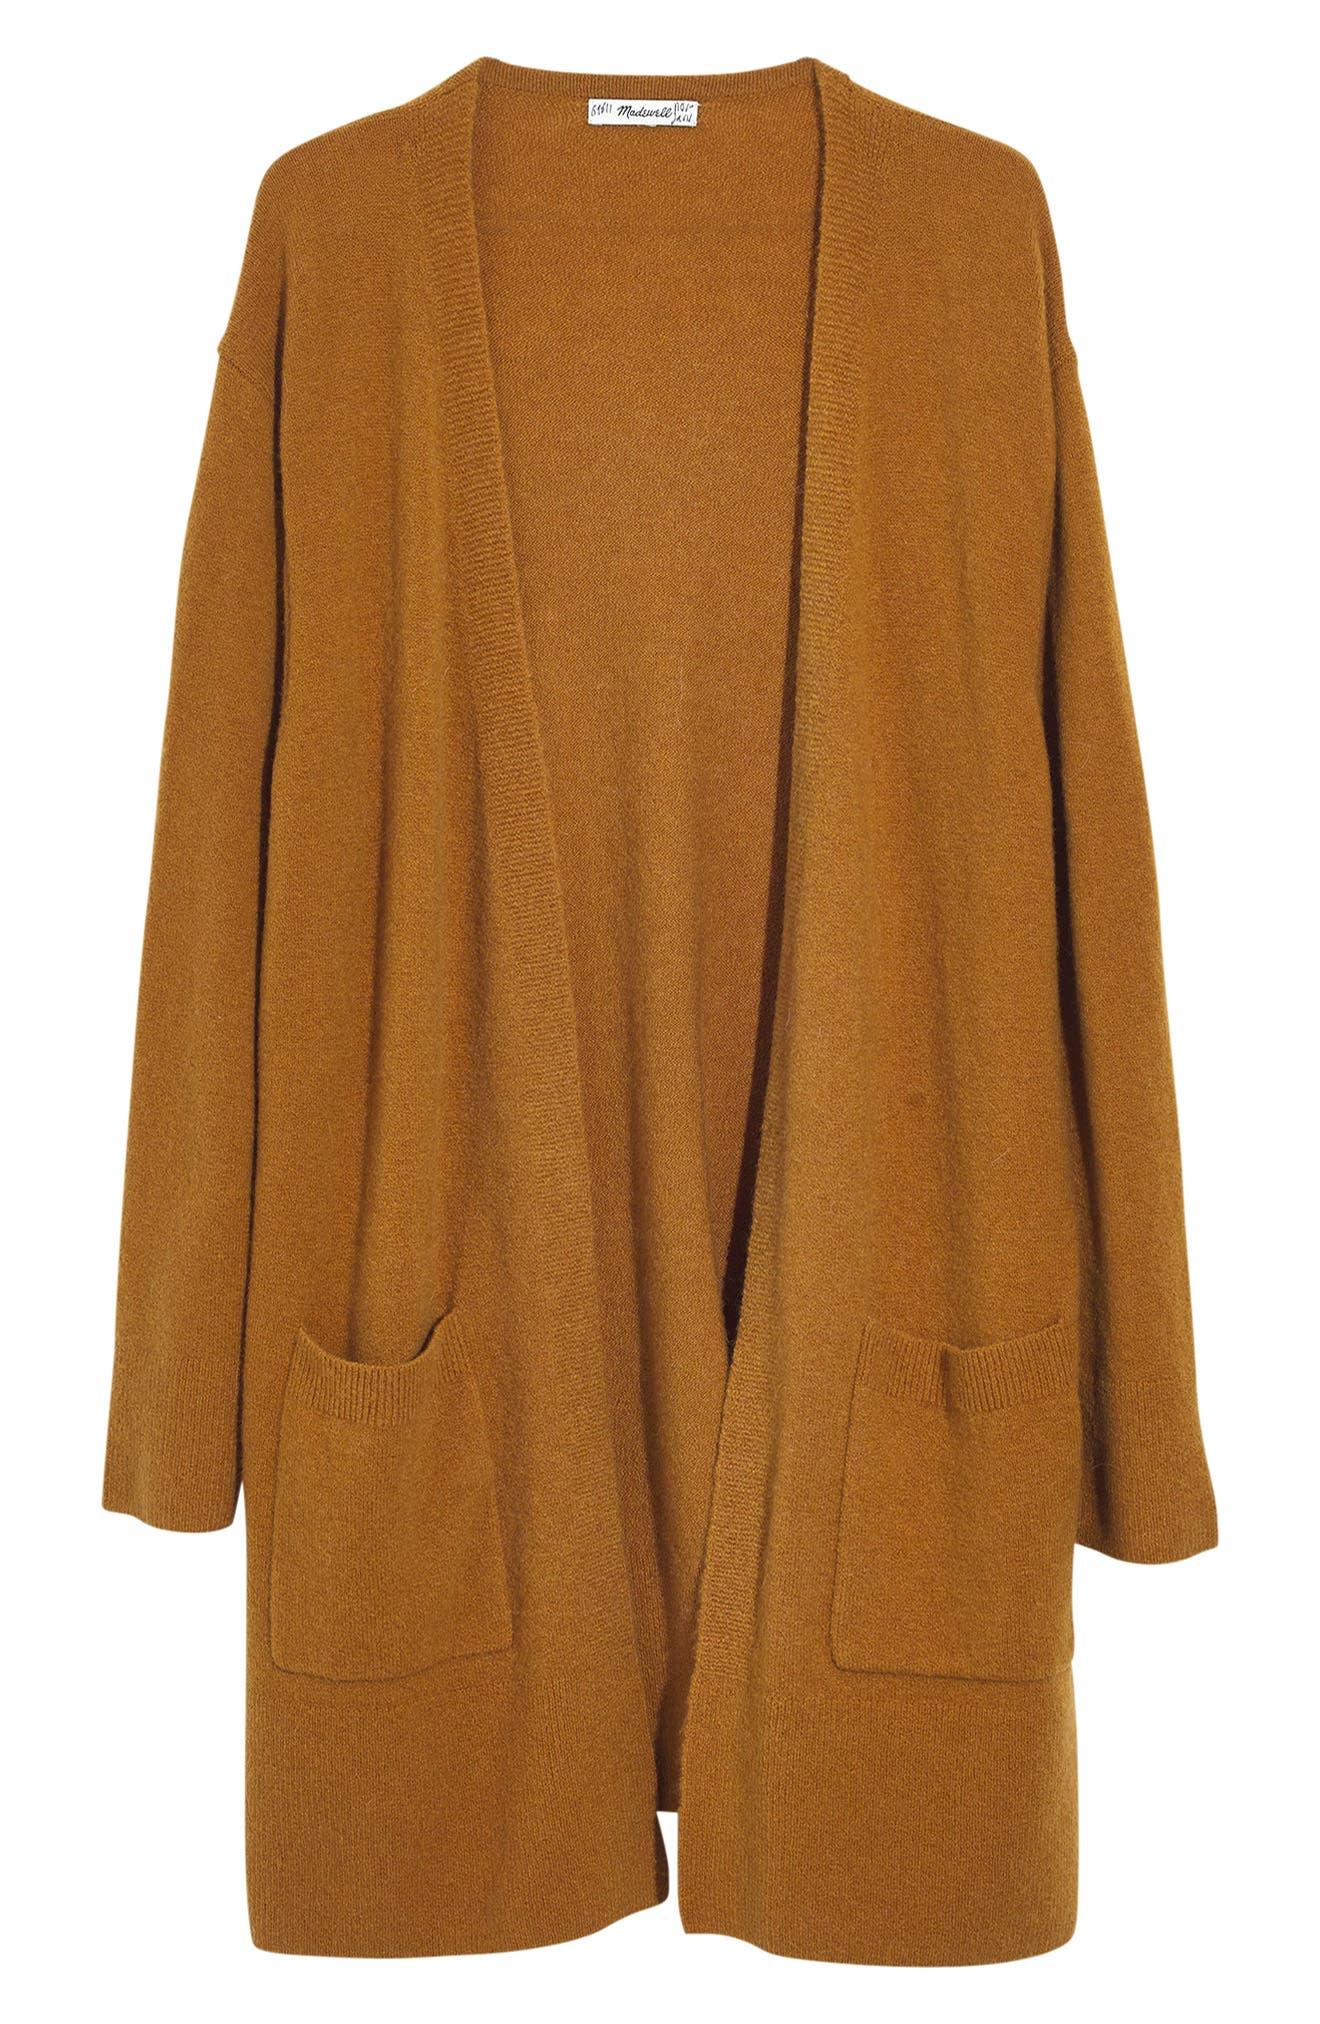 MADEWELL, Kent Cardigan Sweater, Alternate thumbnail 5, color, 801